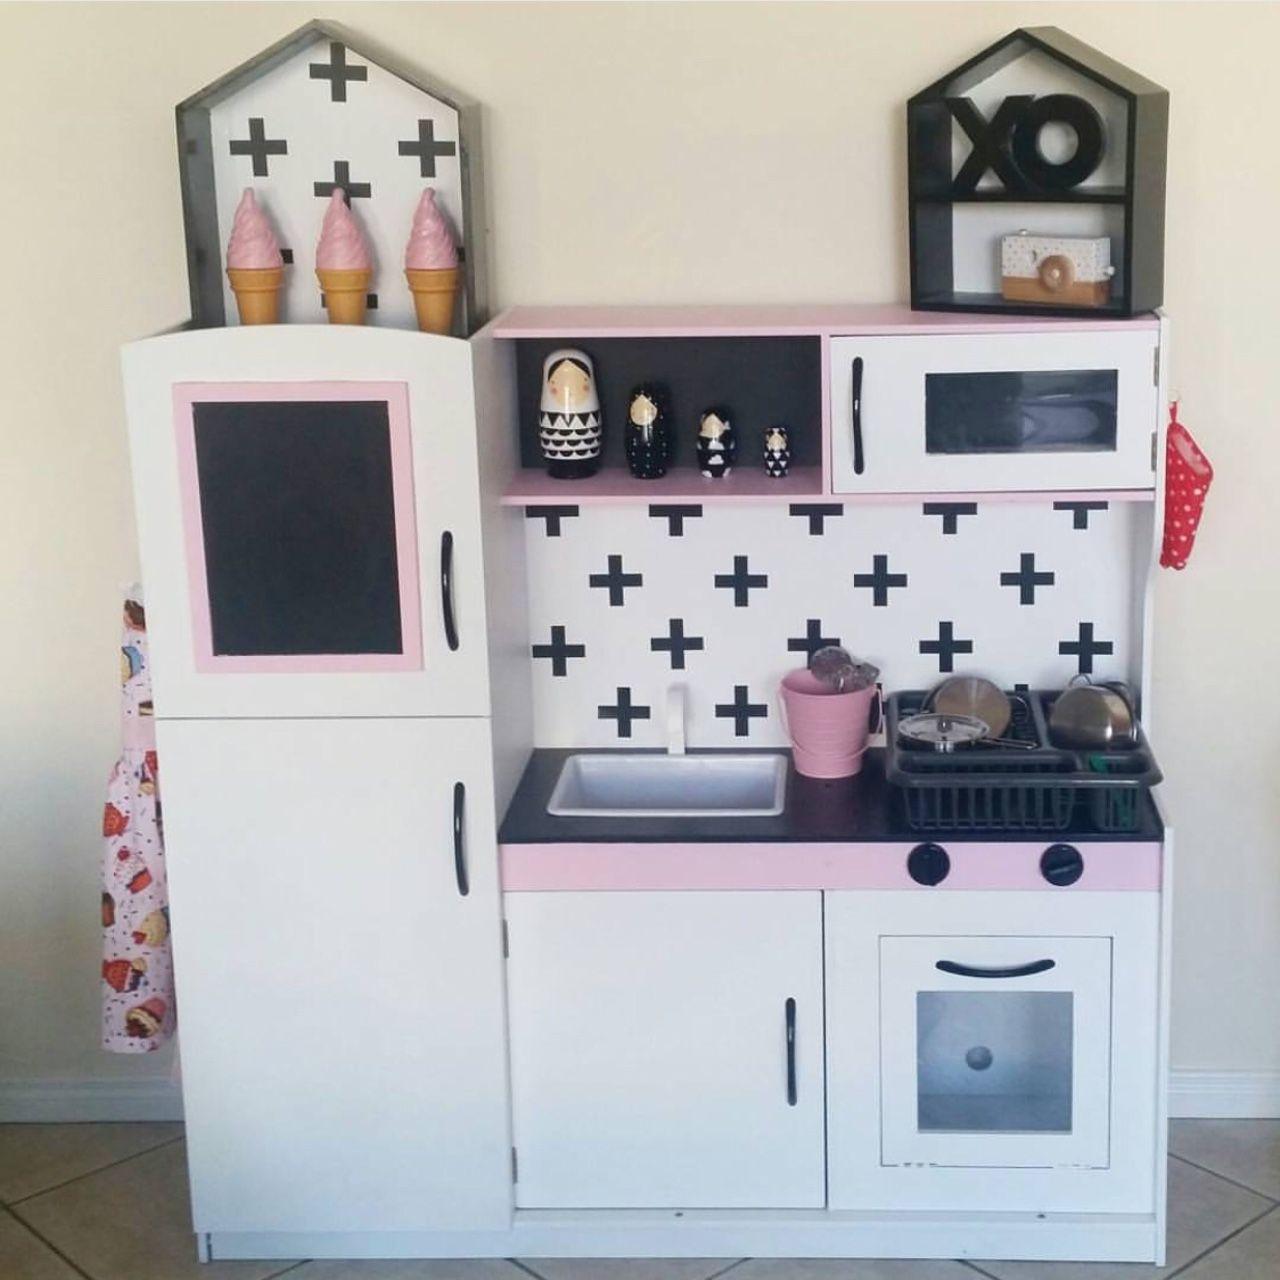 kmart hack our urban box kmart hacks kids kitchen play kitchen on kitchen ideas kmart id=67344